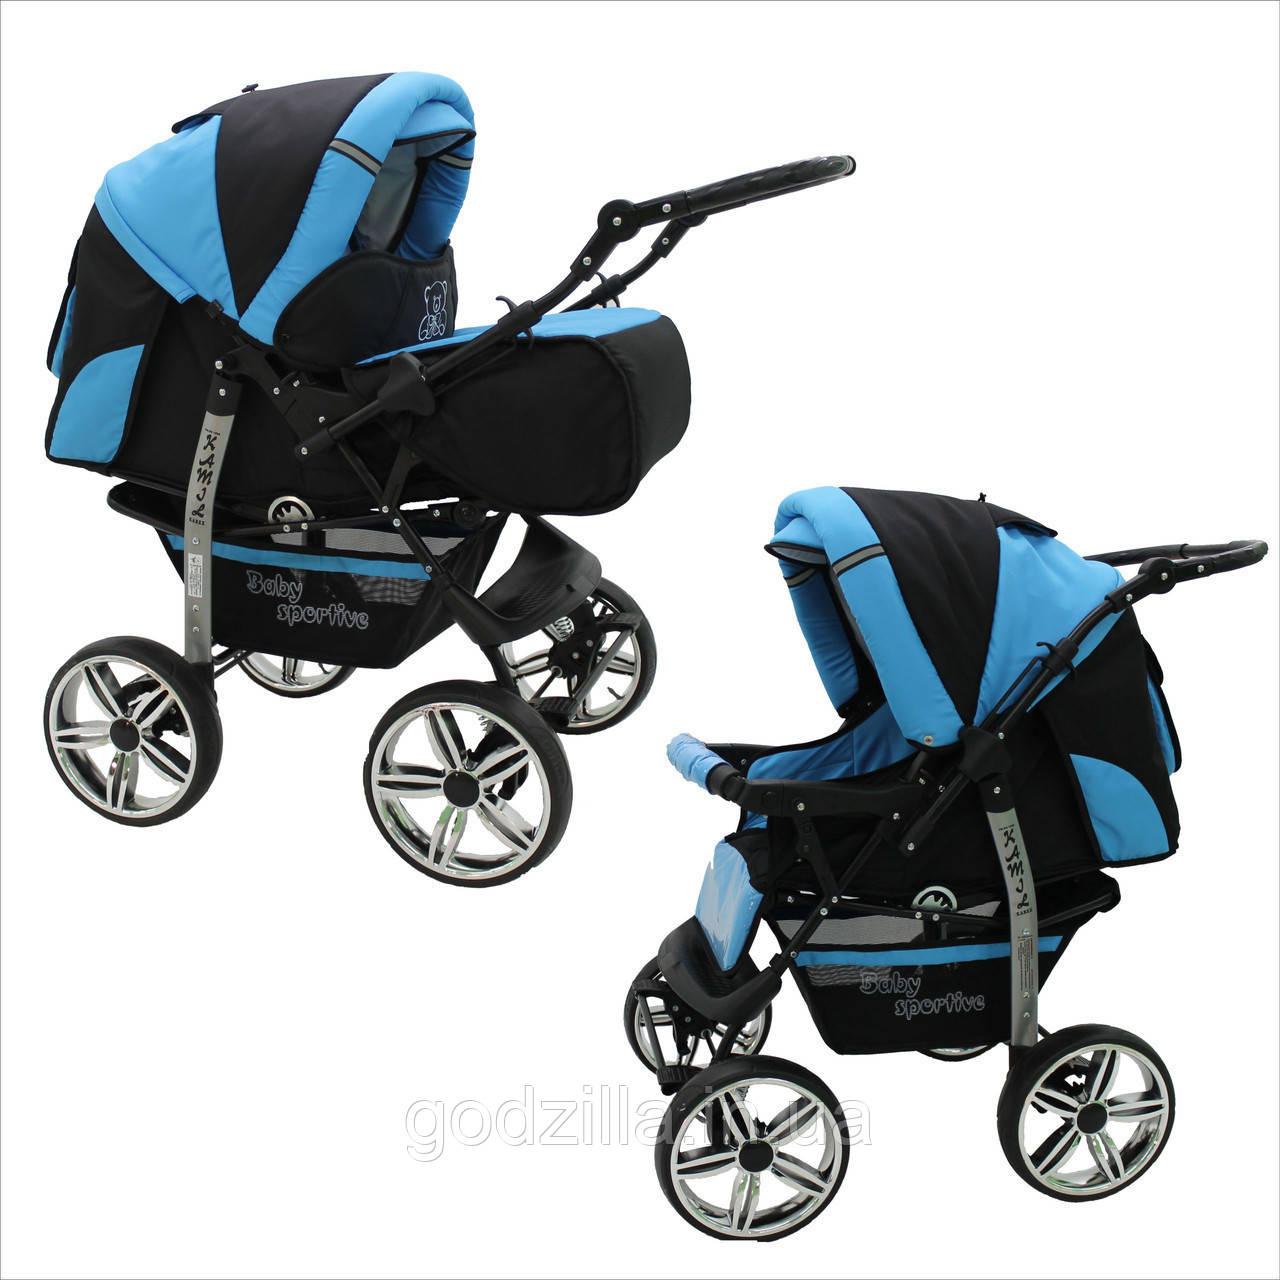 Прогулочная детская коляска KAMIL